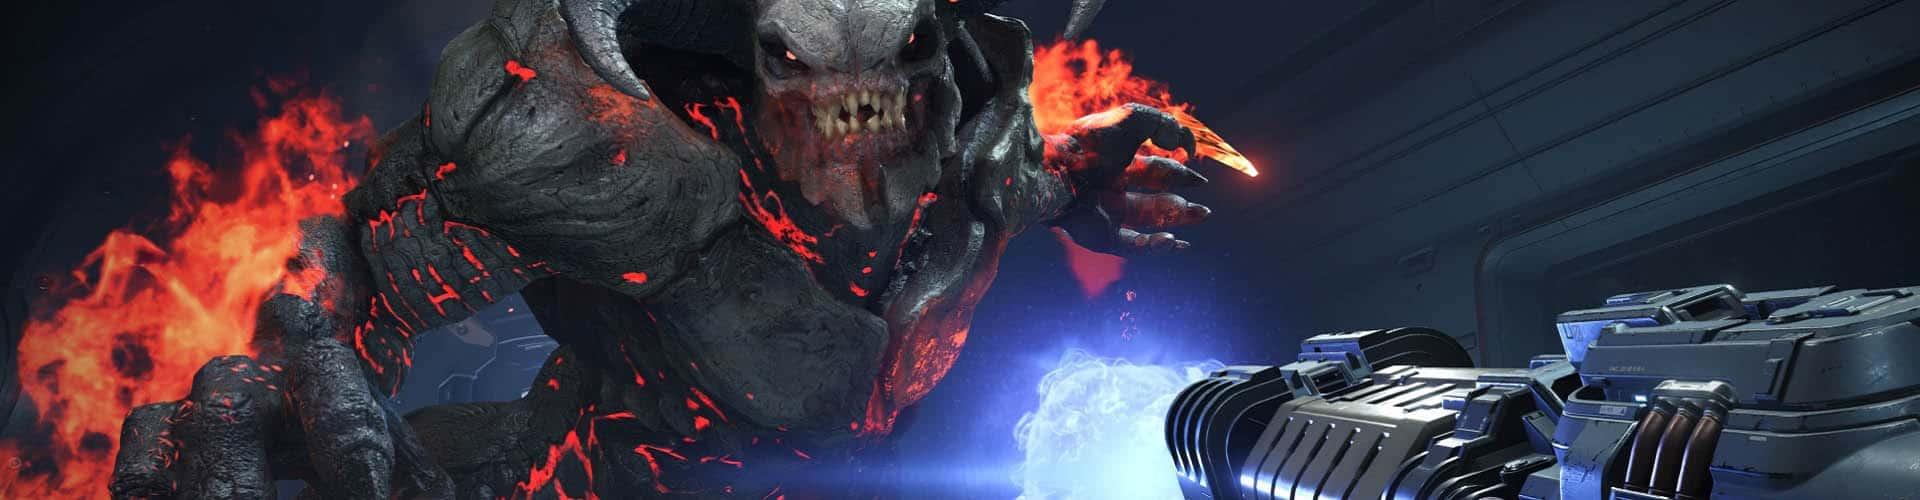 Doom Eternal Release Date, Trailer, News, and Rumors